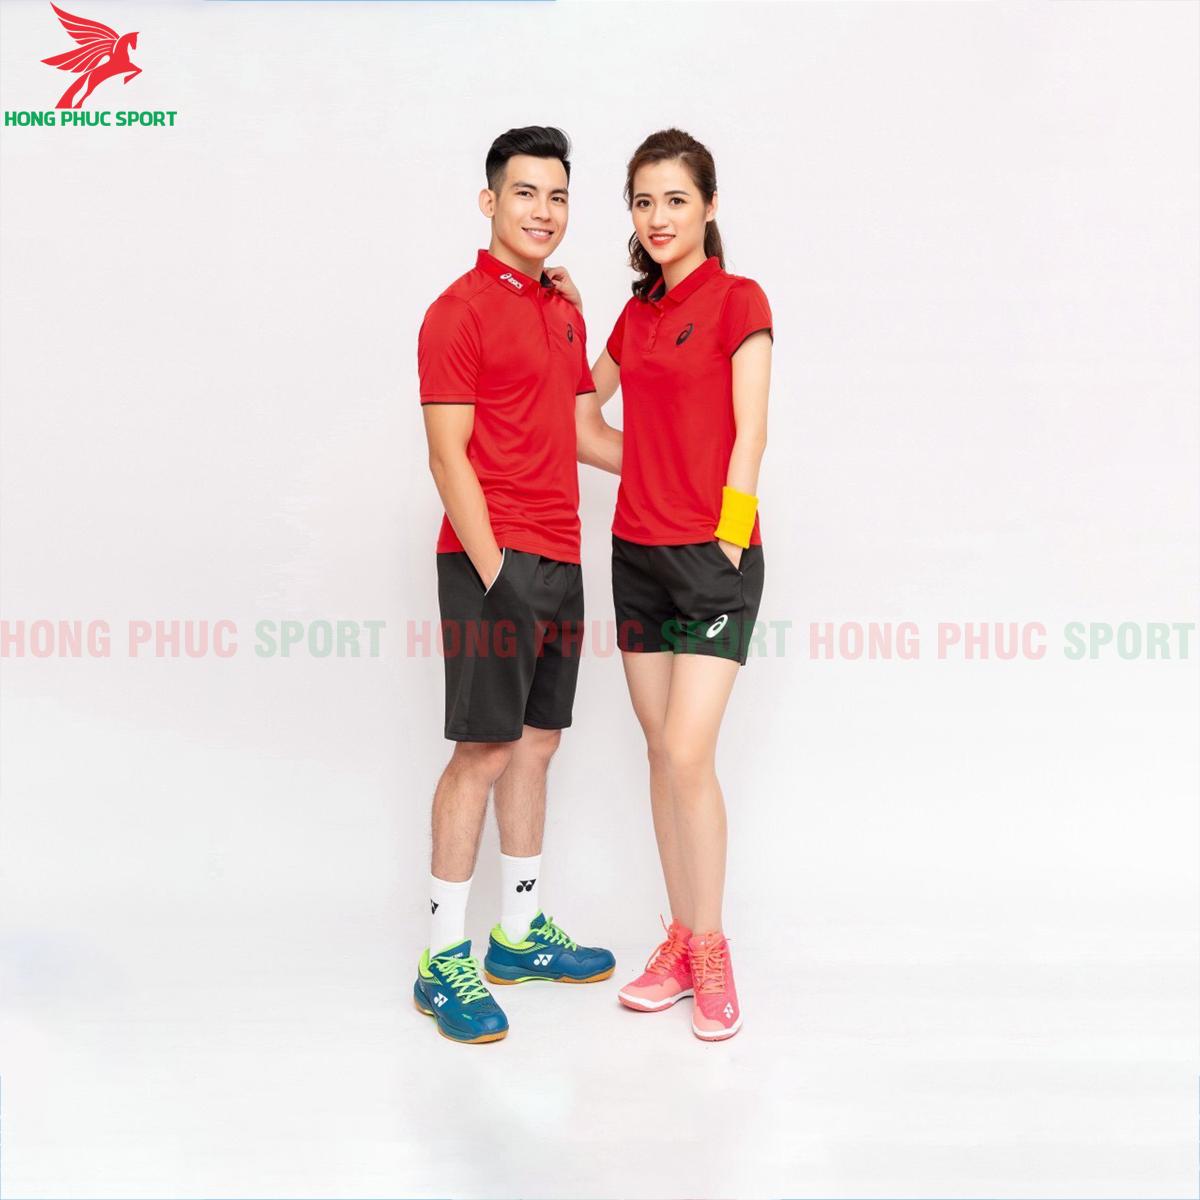 https://cdn.hongphucsport.com/unsafe/s4.shopbay.vn/files/285/ao-tennis-asic-2020-mau-do-5f76ec0e3f9da.png